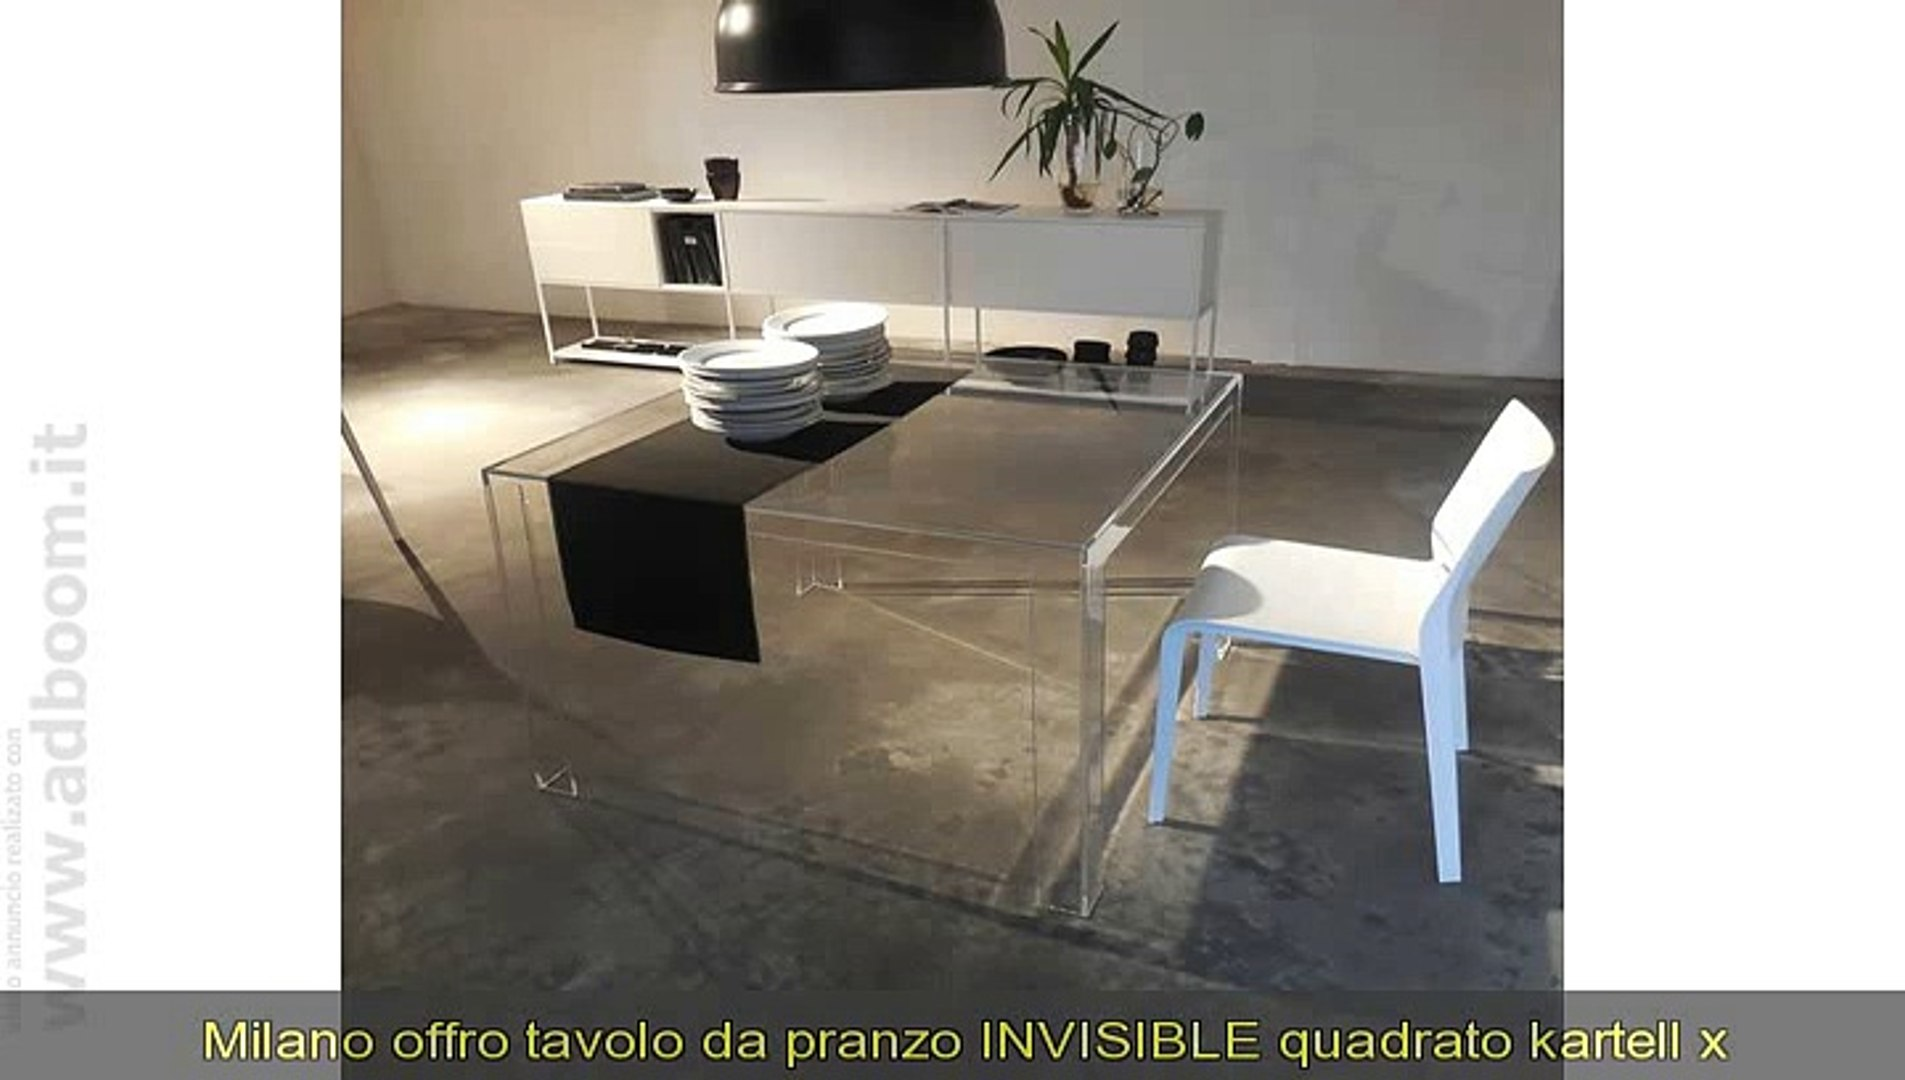 Kartell Tavoli Da Pranzo.Milano Tavolo Da Pranzo Invisible Quadrato Kartell X Cucina